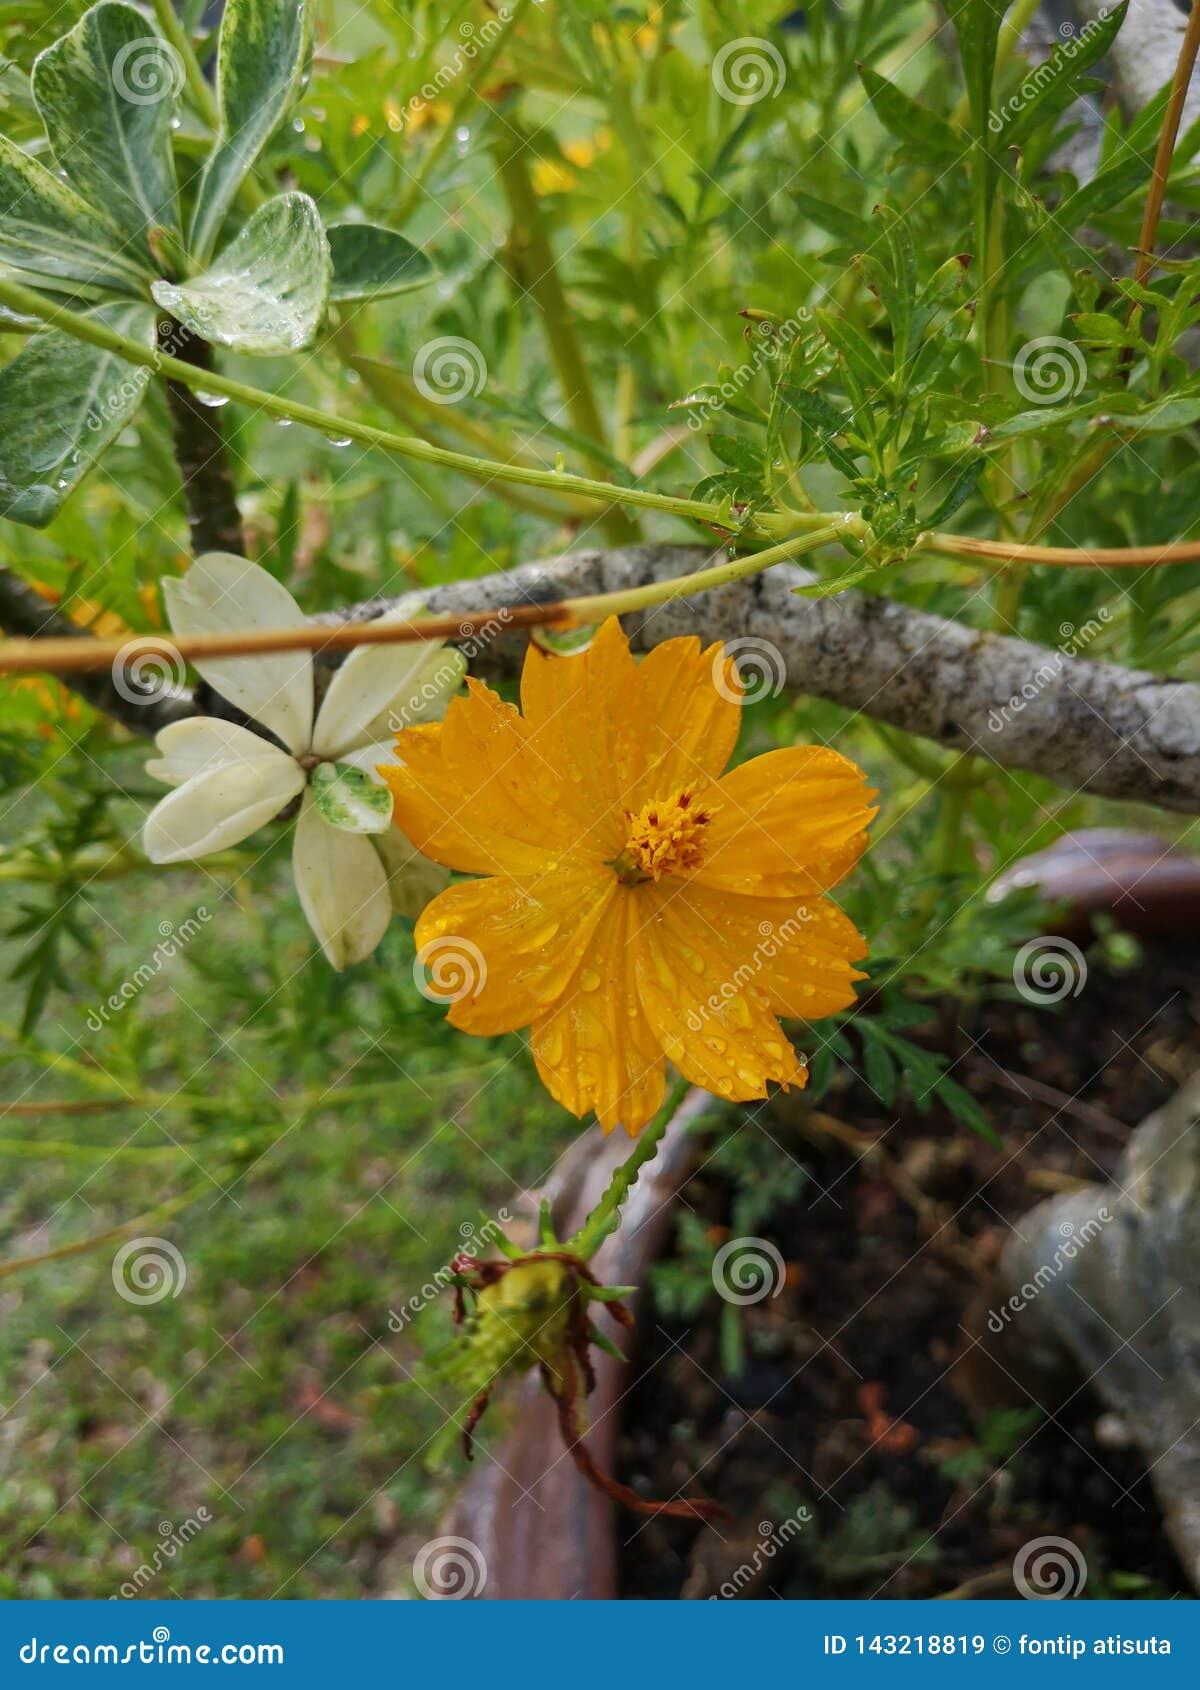 Schwefel-Kosmos or†‹gelbes Kosmos flower†‹